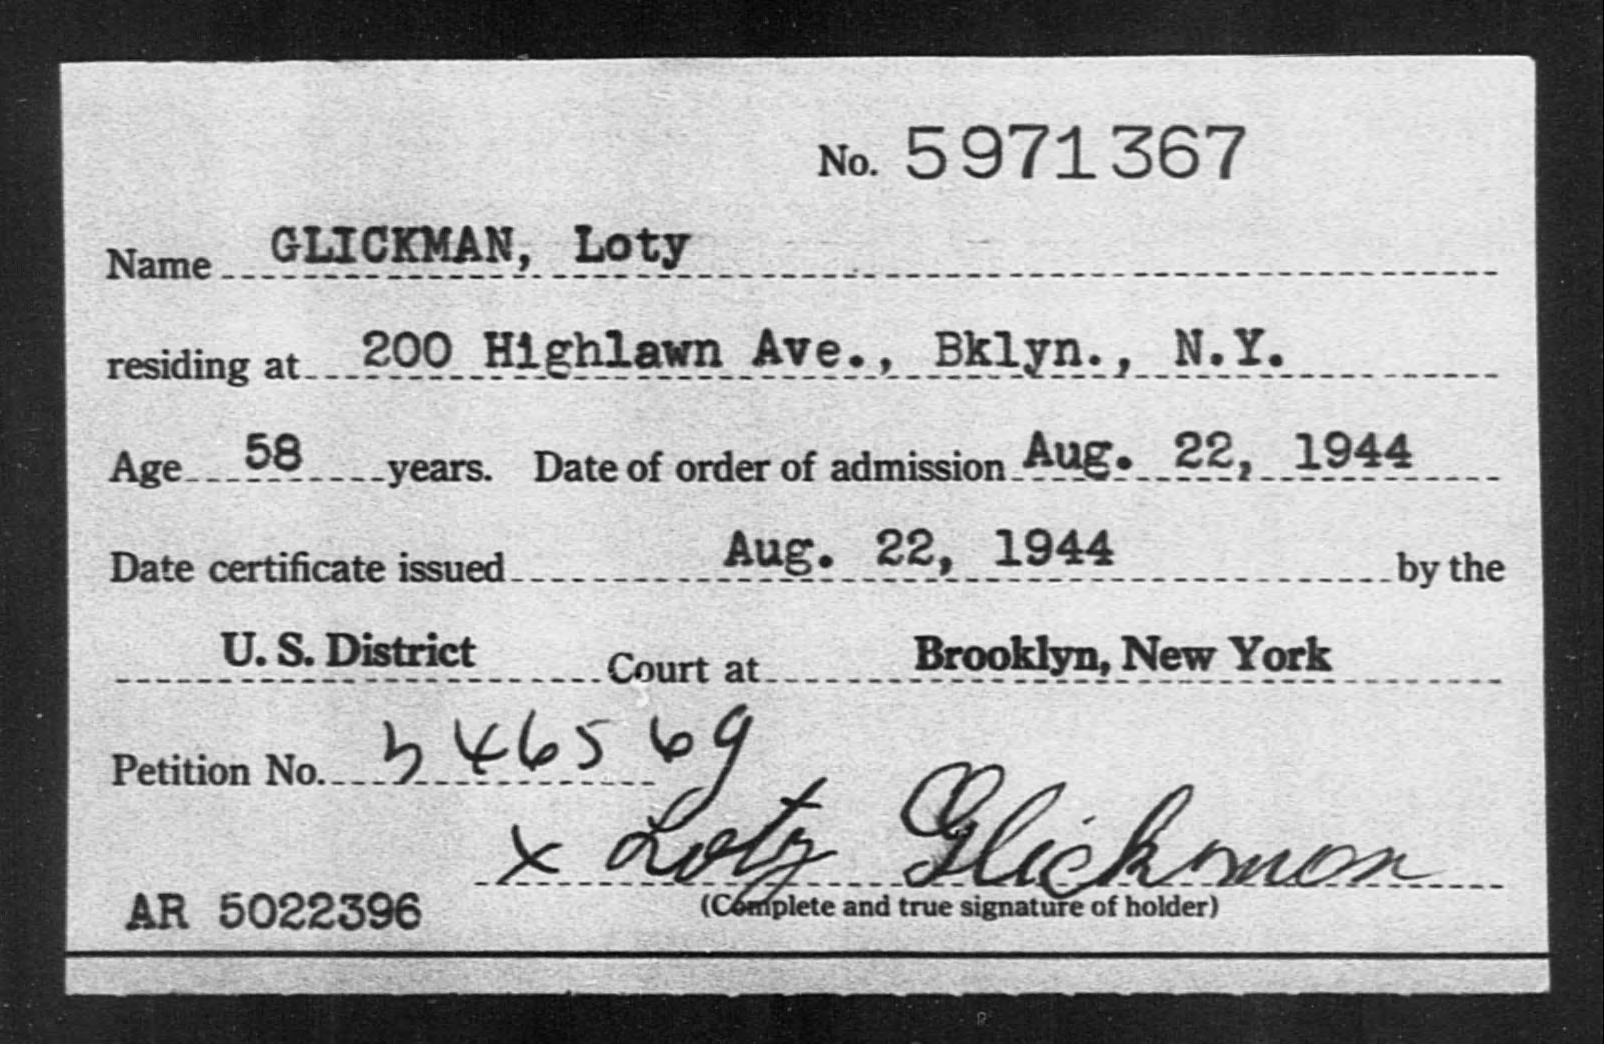 GLICKMAN, Loty - Born: [BLANK], Naturalized: 1944